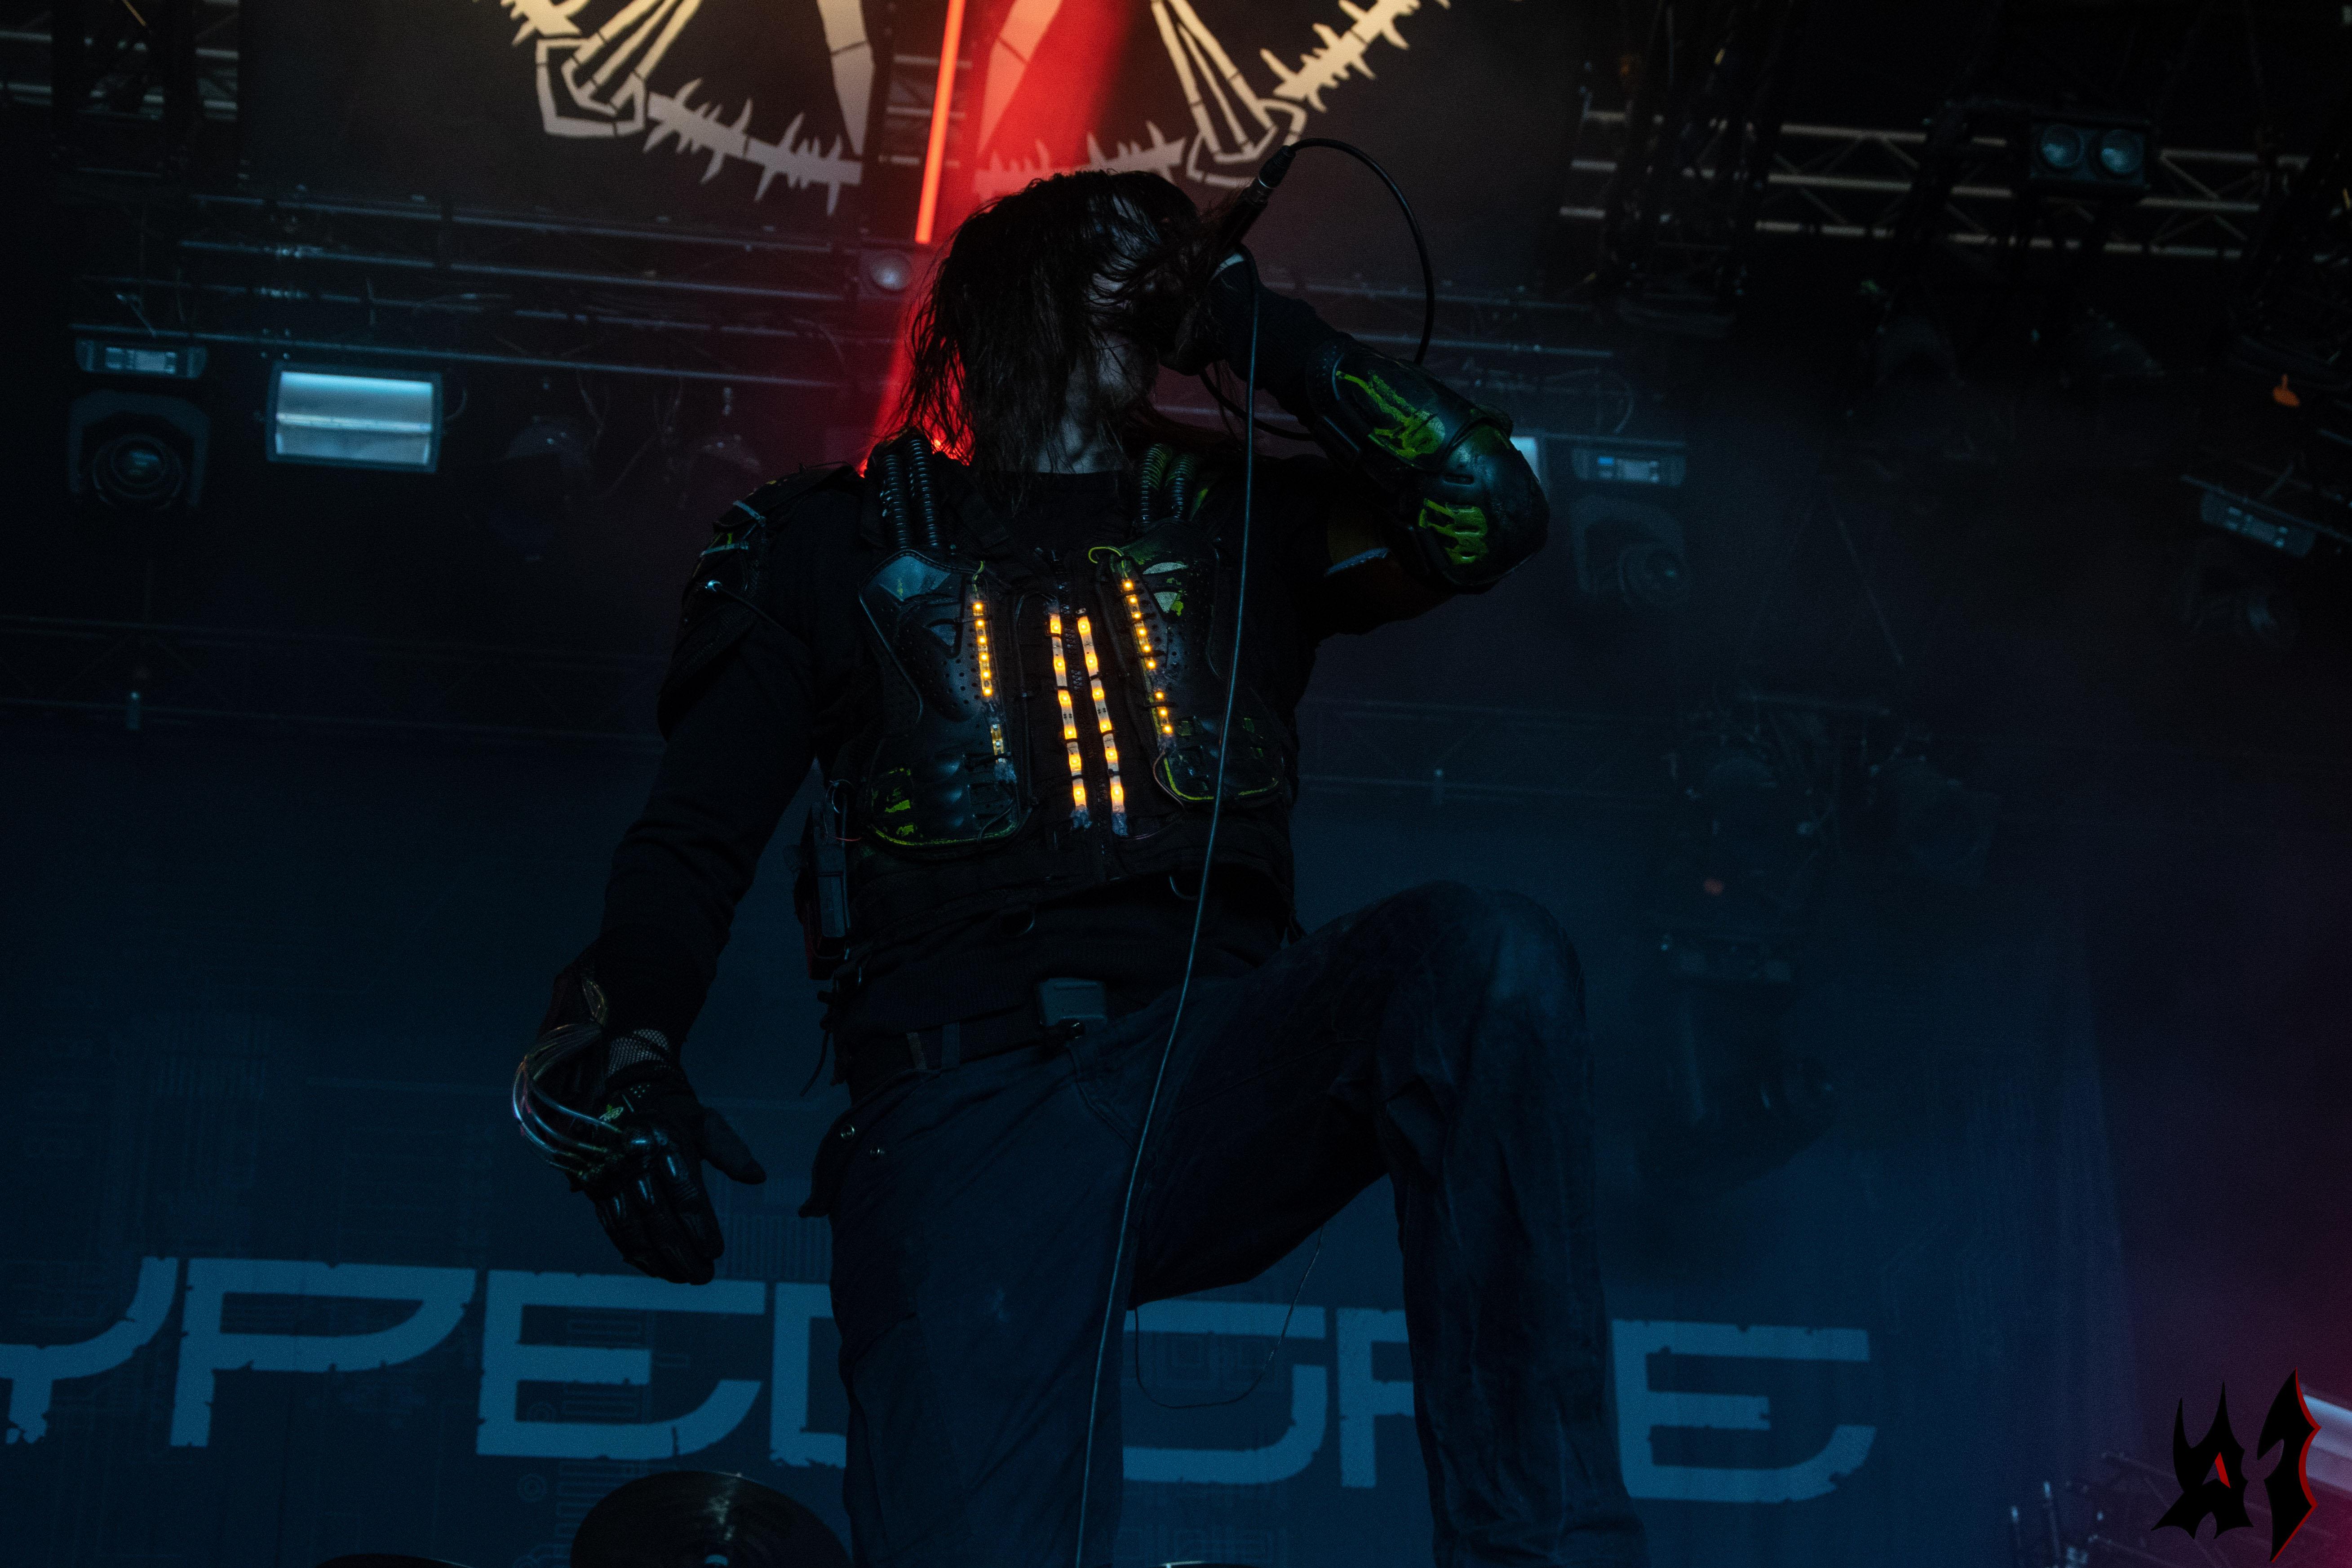 Hellfest - Cypecore - 6